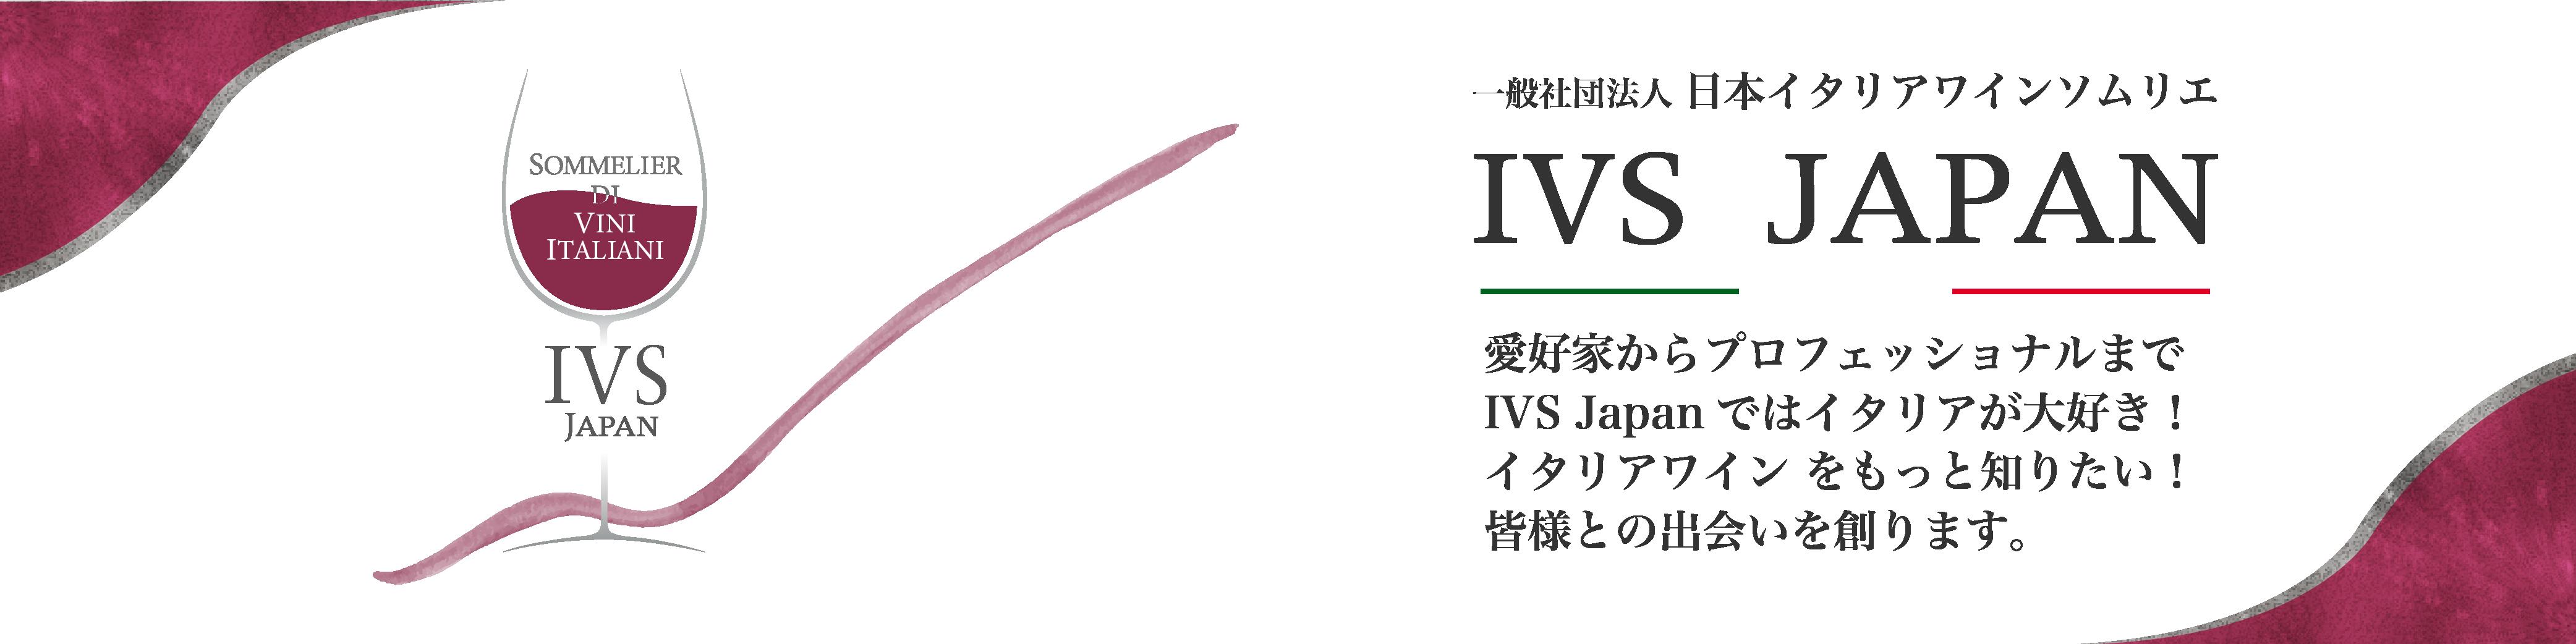 IVS Japan トップ画像